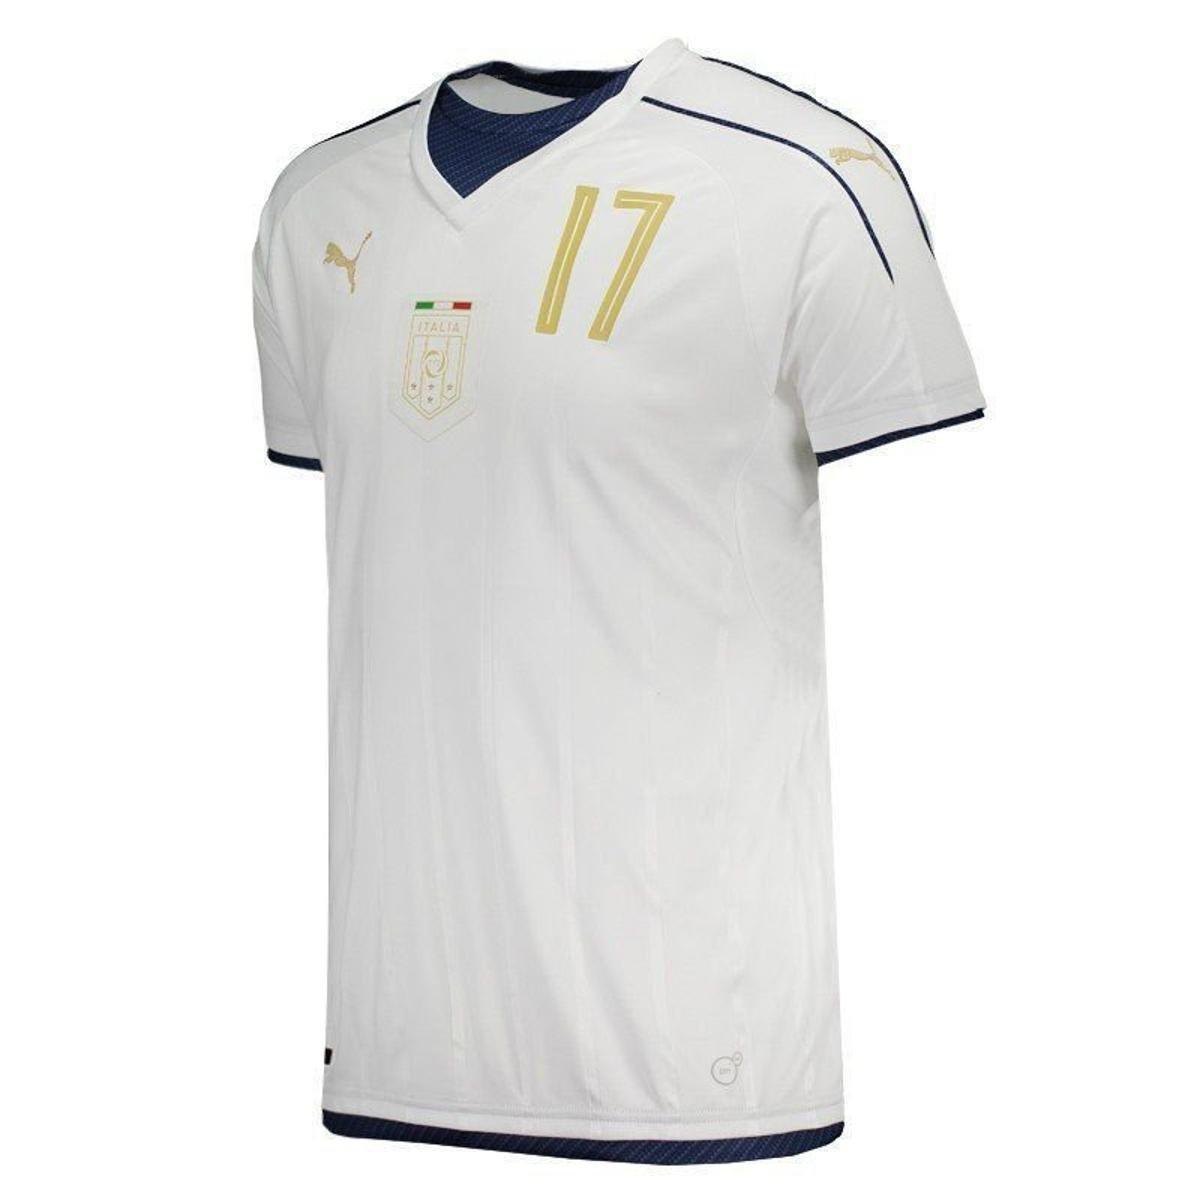 a1a44044e8 Camisa Puma Itália Away 2017 Tributo N°17 Eder Masculina - Branco ...